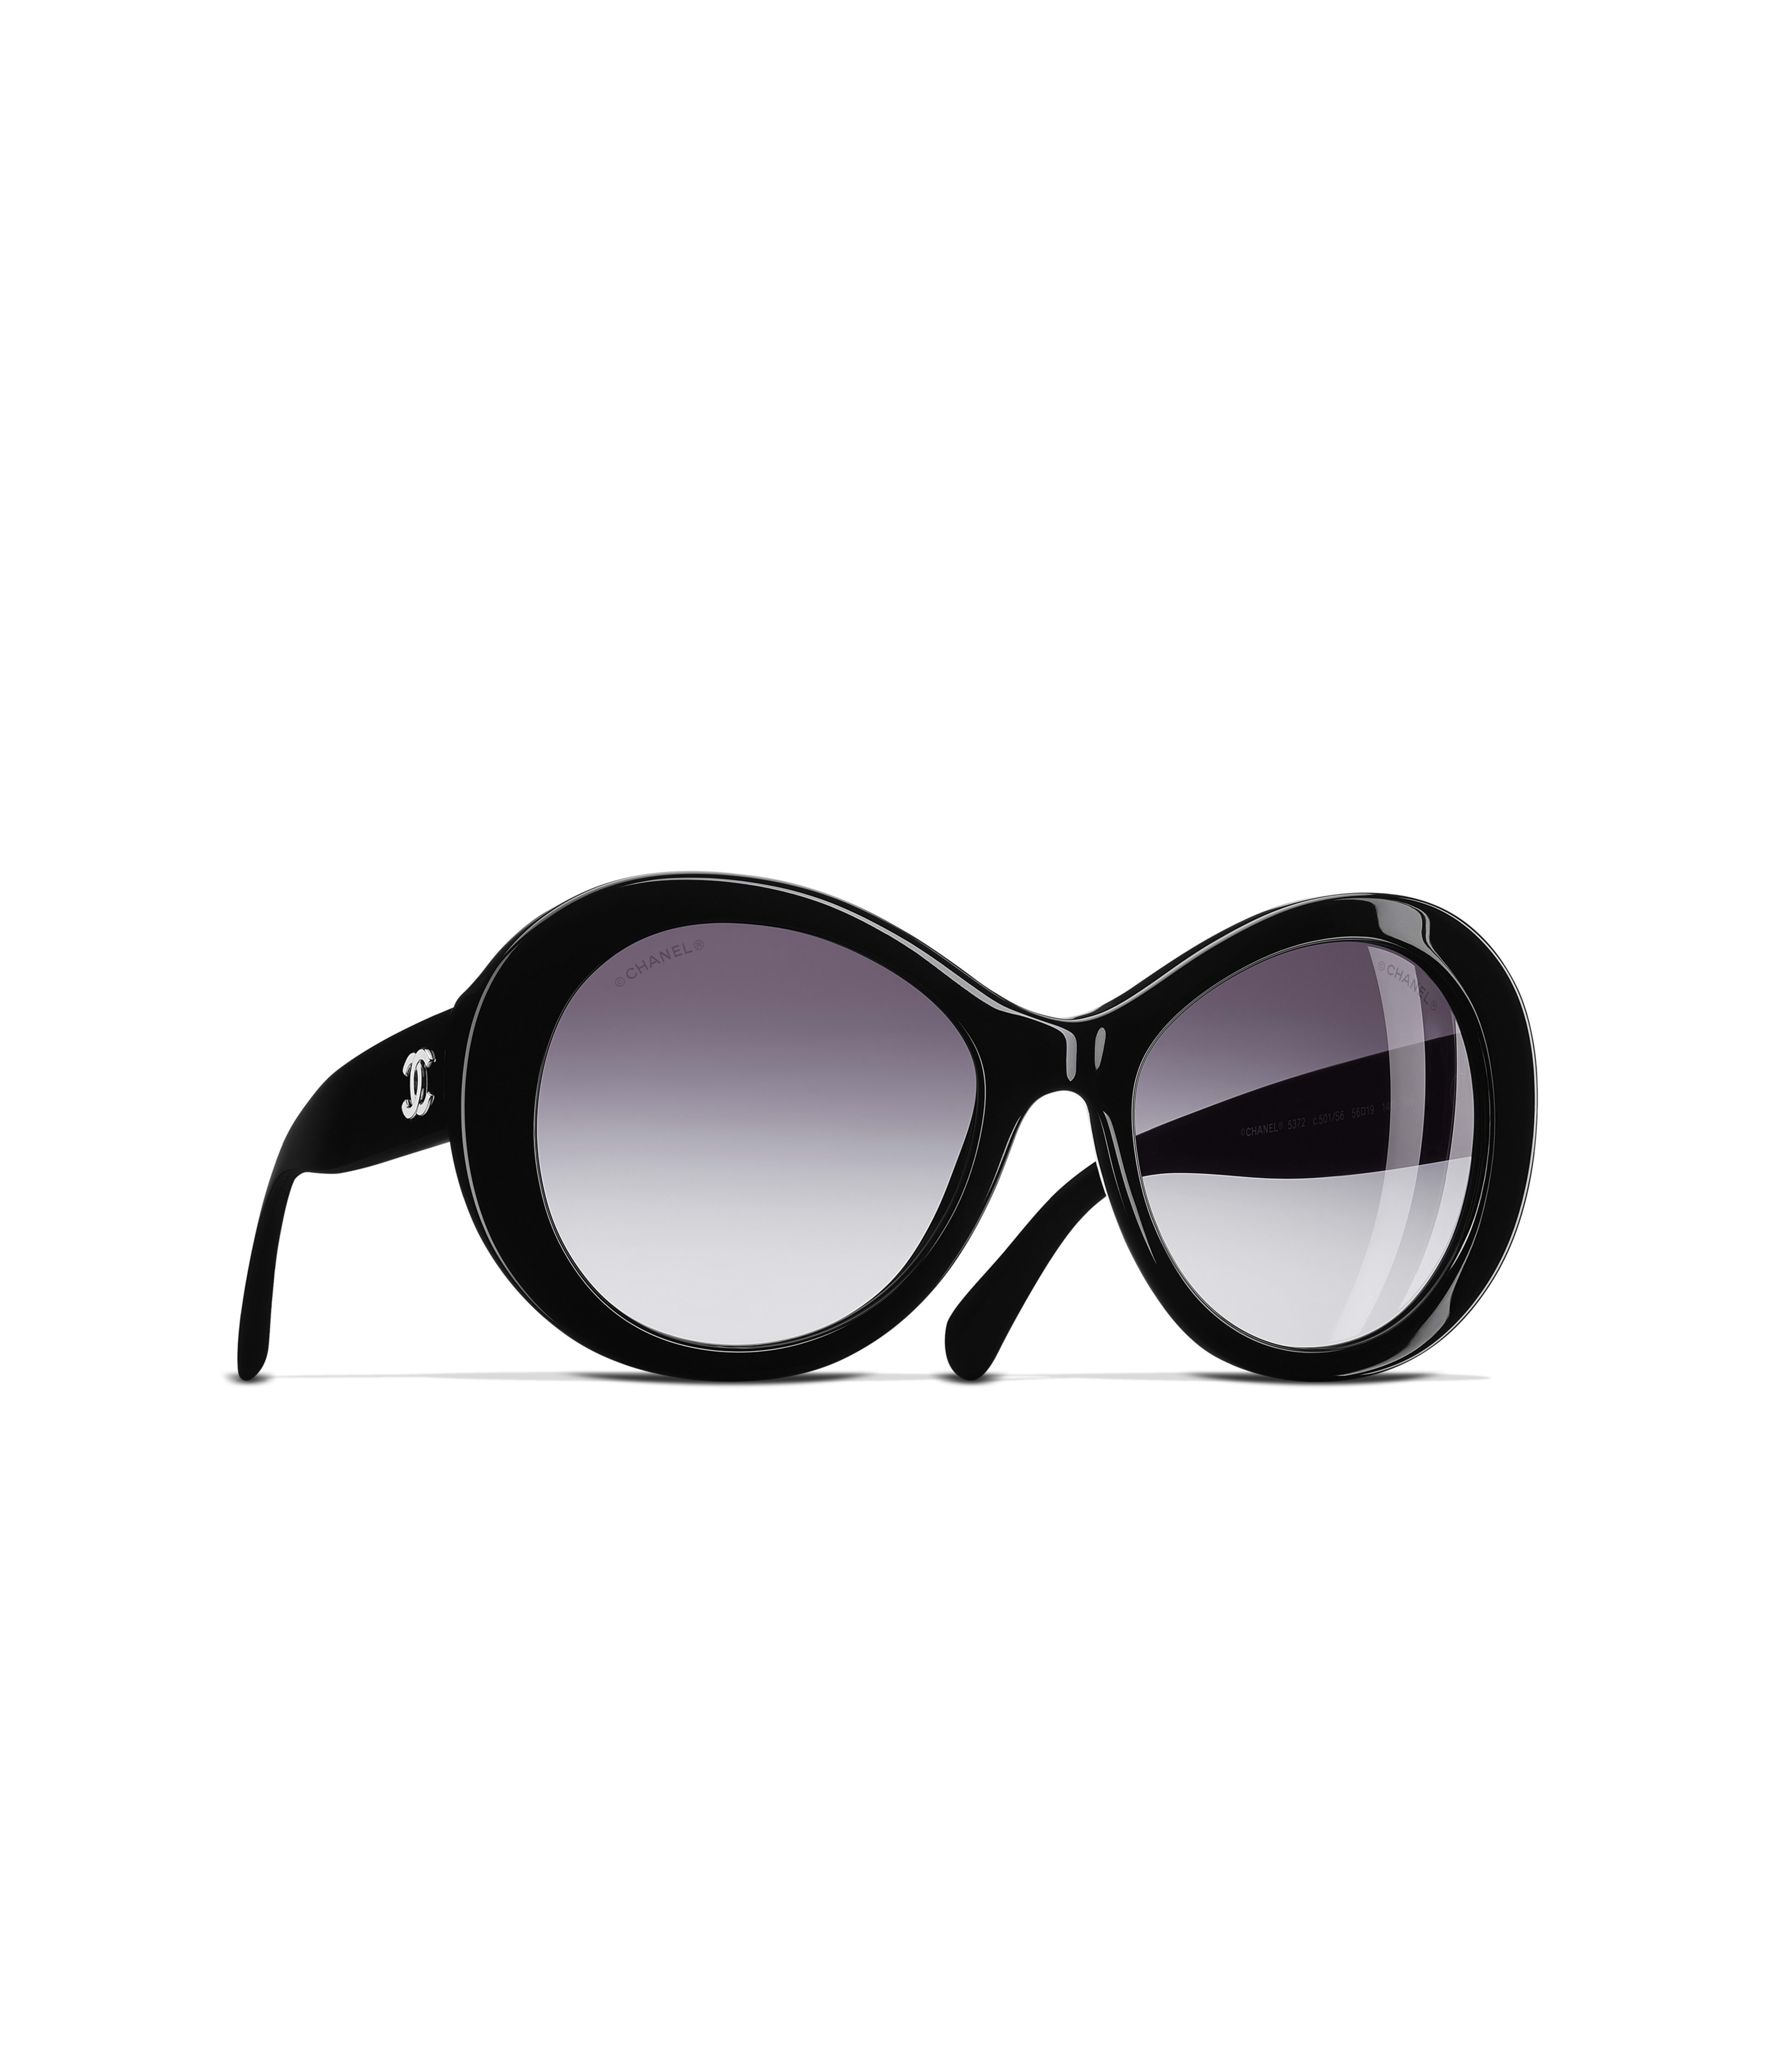 f157ce27f129 Oval Chanel Sunglasses Fake